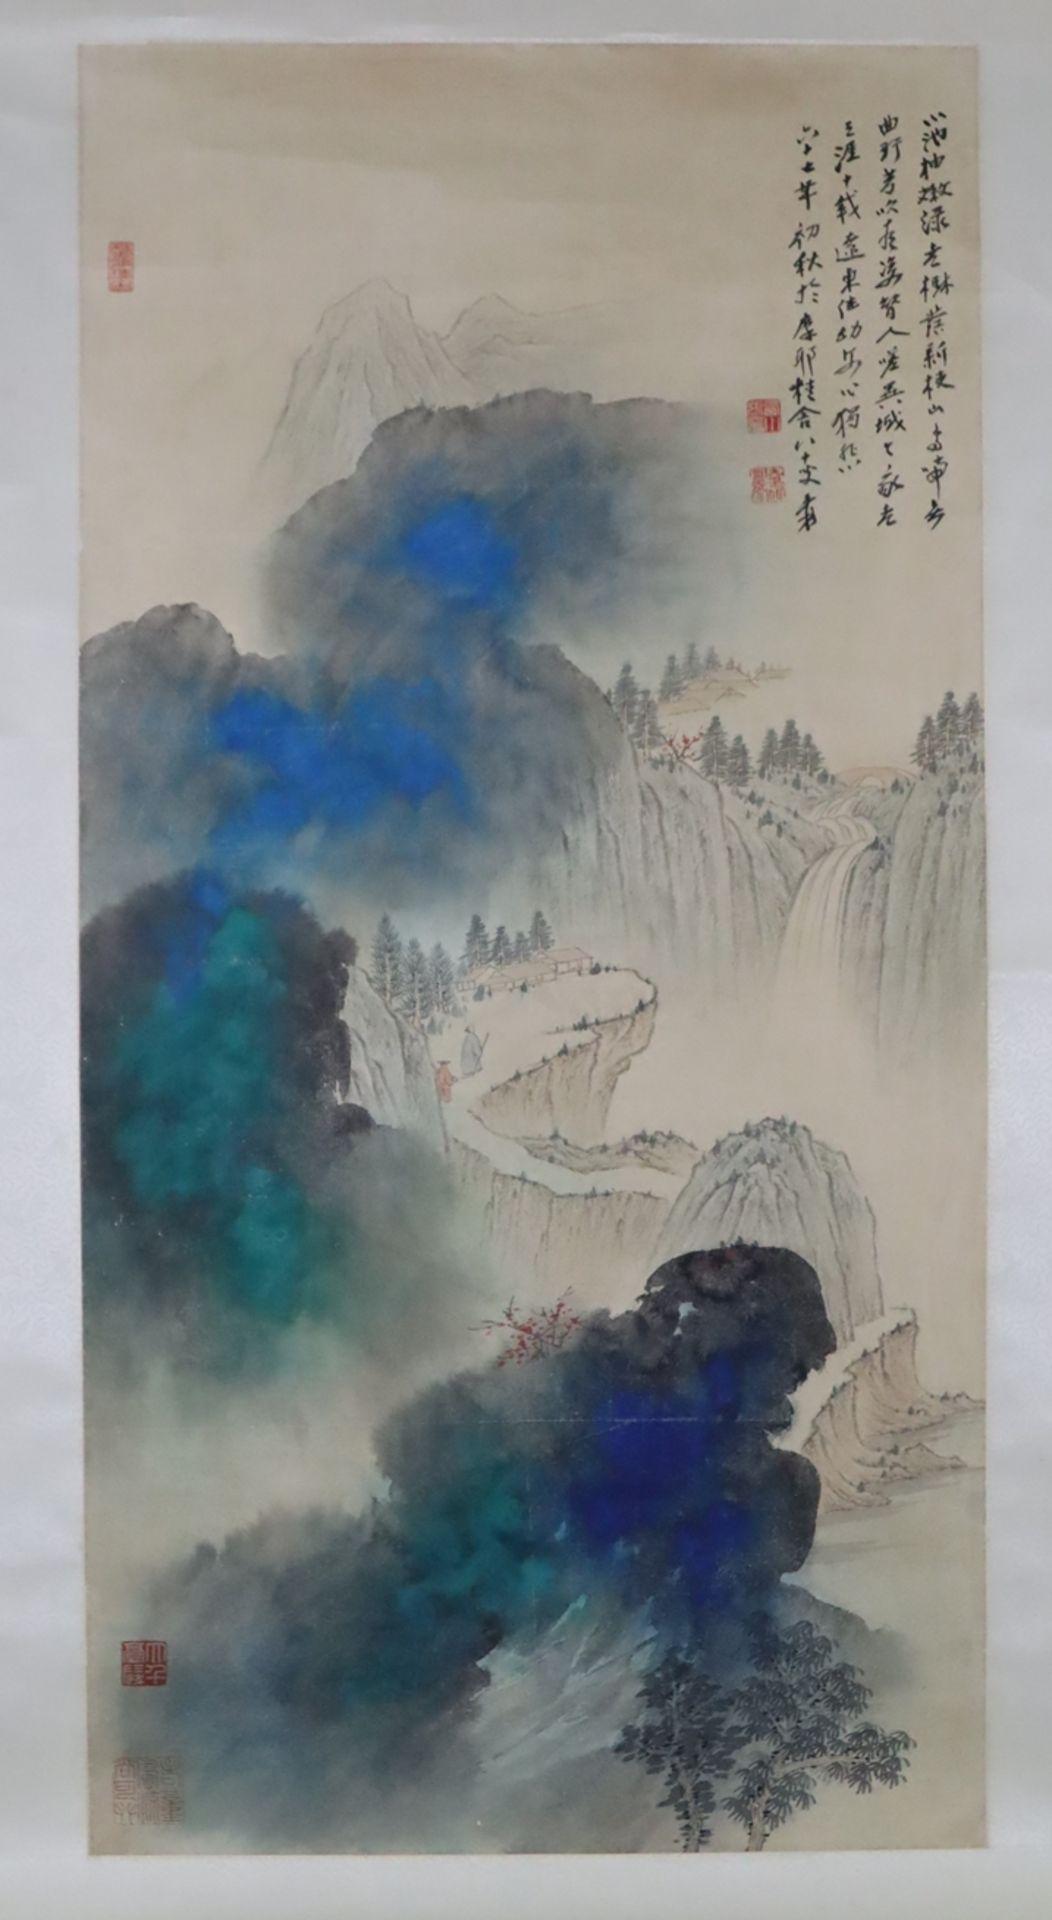 Chinesisches Rollbild - gesiegelt Zhang Daqian (   Chinese Hanging Scroll - sealed Zhang Daqian (18